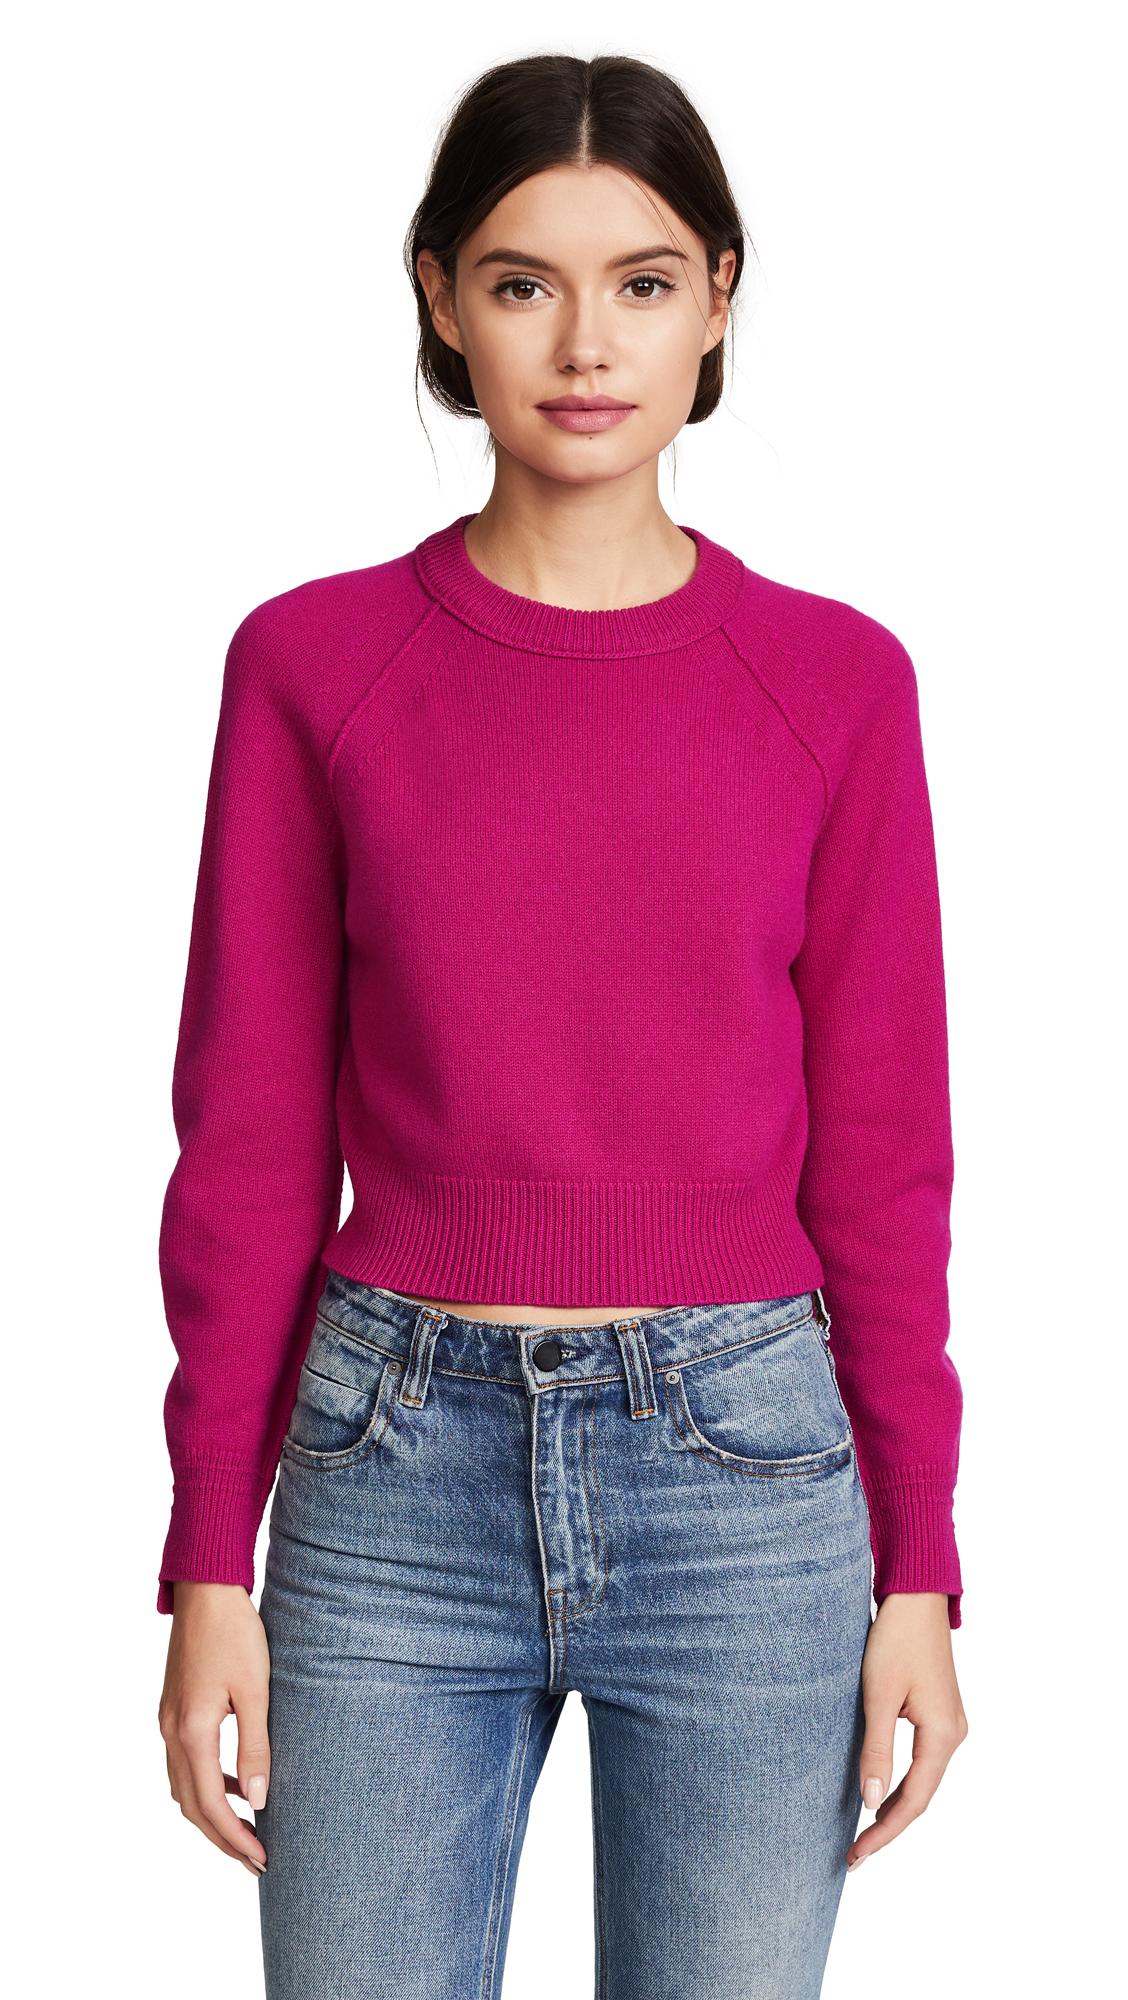 Helmut Lang Cashmere Sweater - Magenta